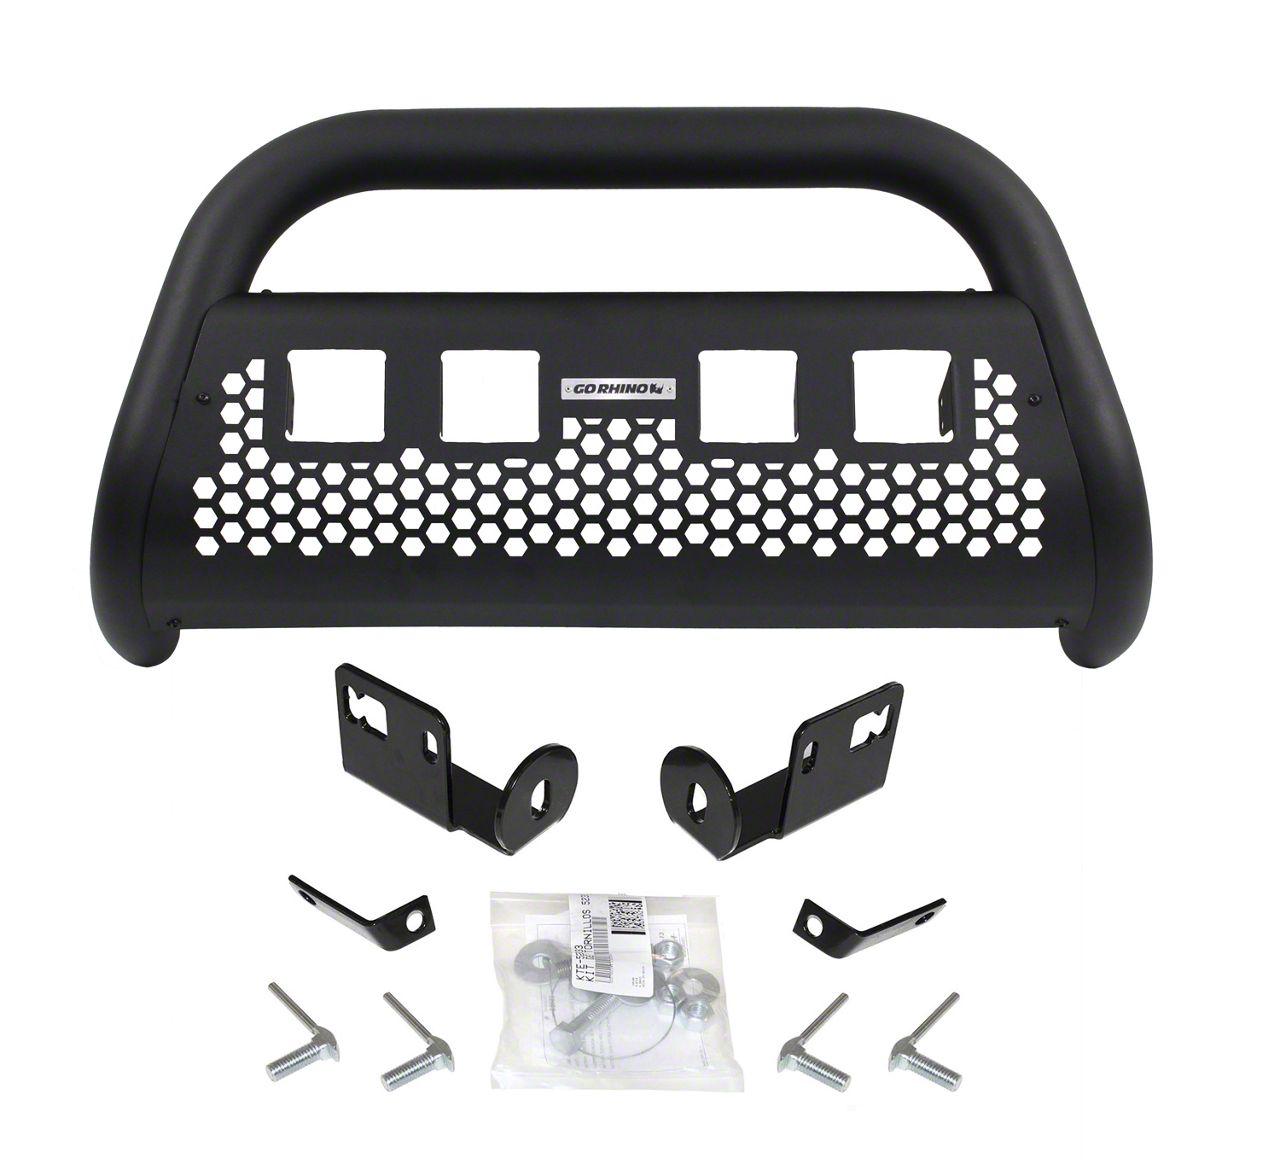 Go Rhino RC2 LR Bull Bar w/ Four LED Cube Light Mounting Brackets - Textured Black (07-13 Silverado 1500)